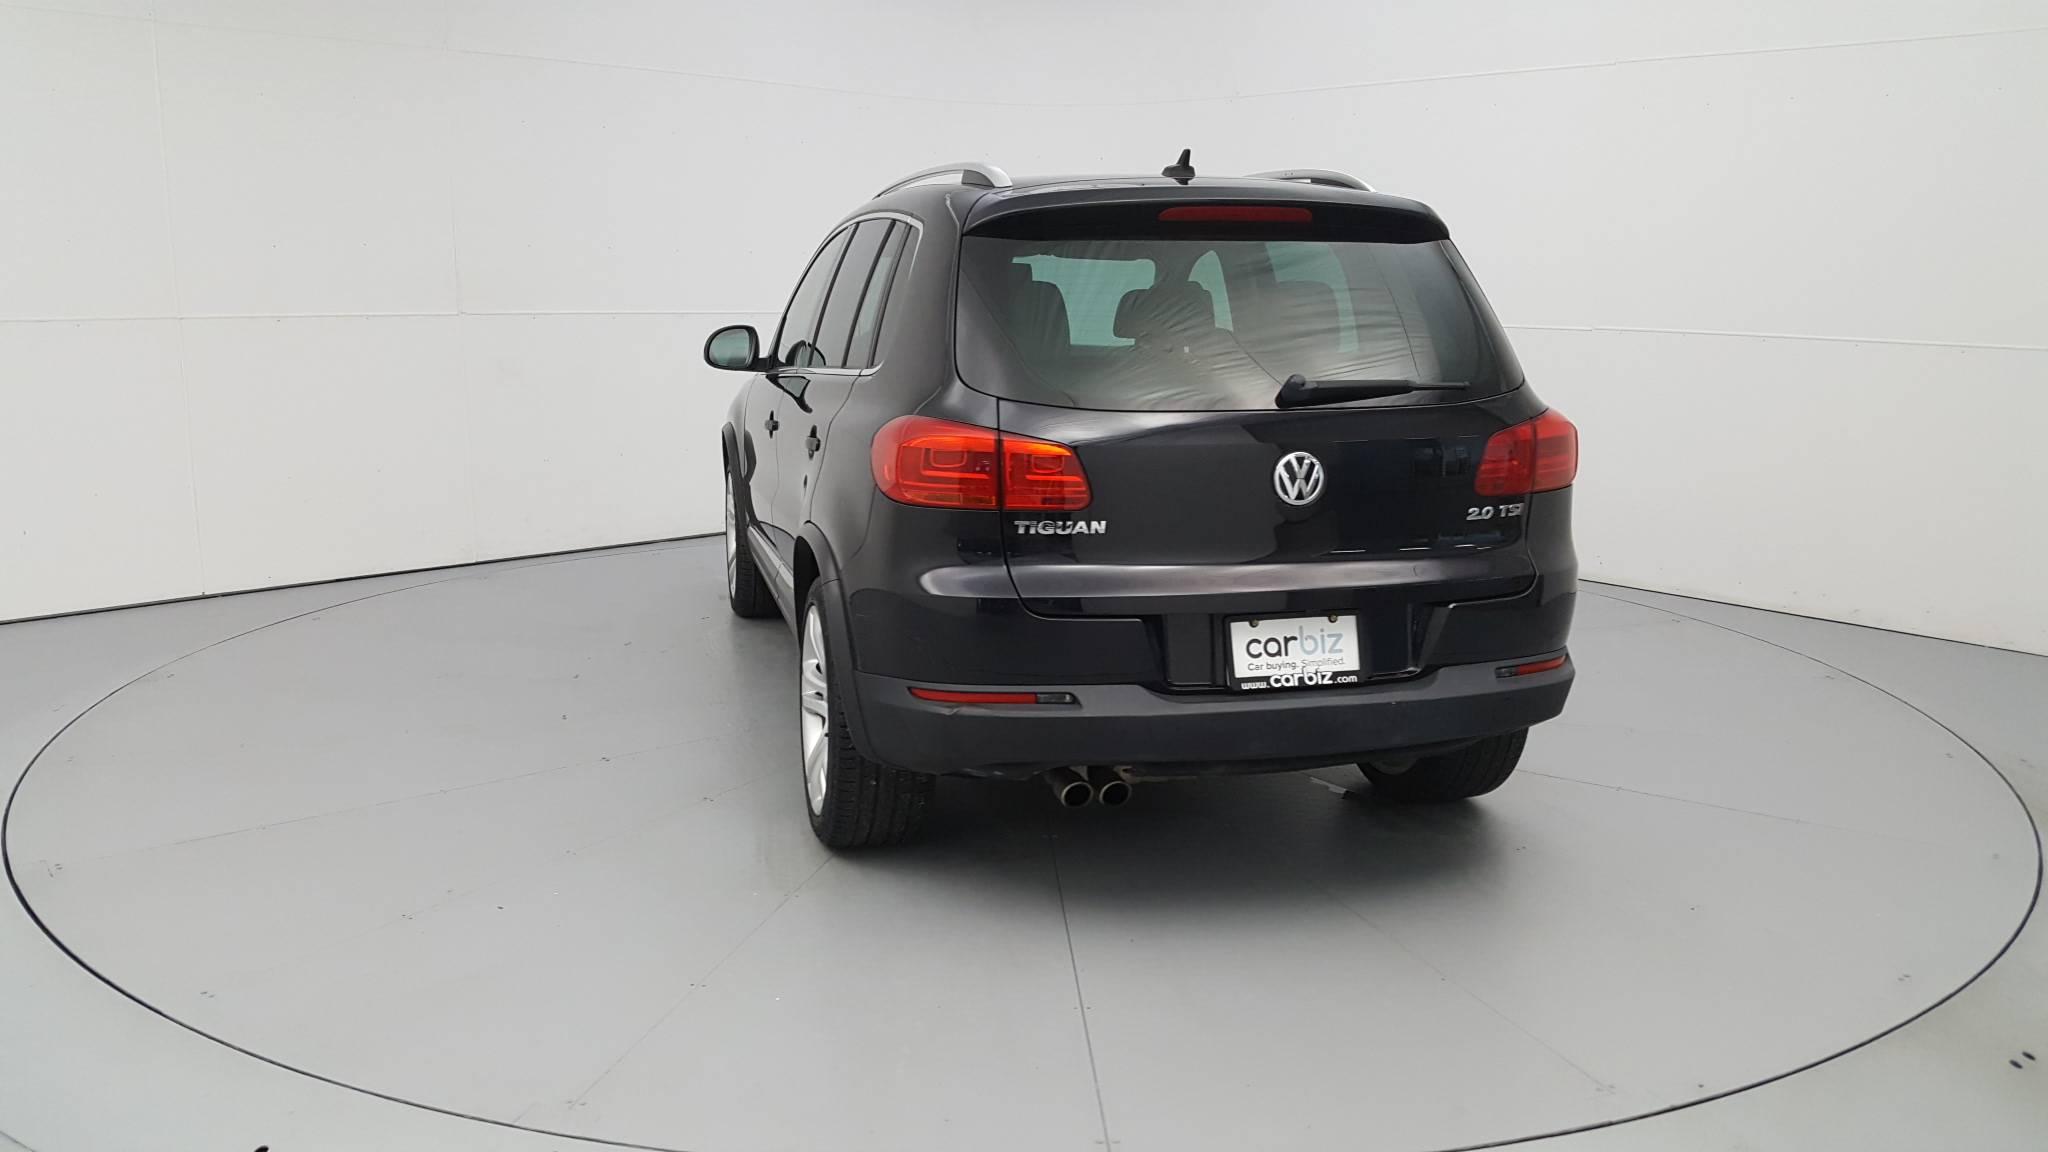 Pre-Owned 2013 Volkswagen Tiguan SEL